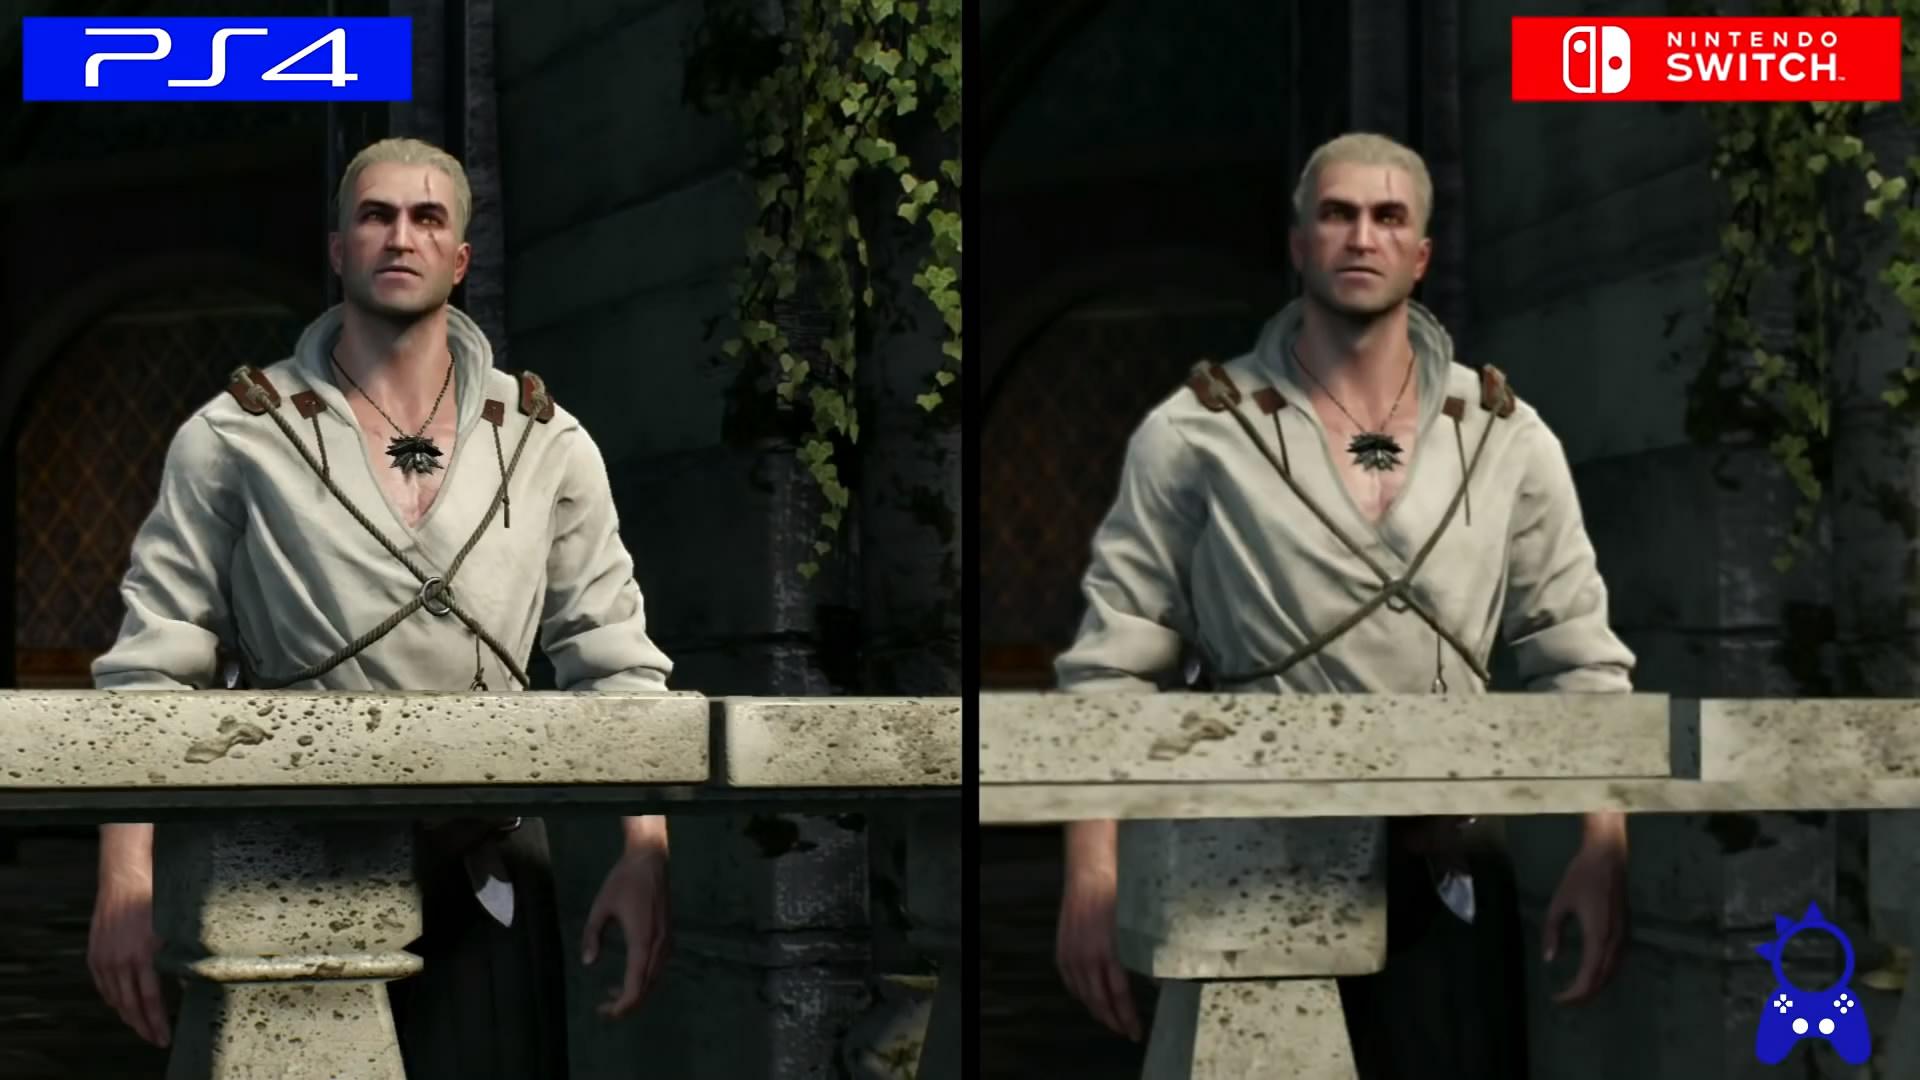 <b>《巫师3》NS版与PS4版画面对比 运行流畅帧数稳定</b>